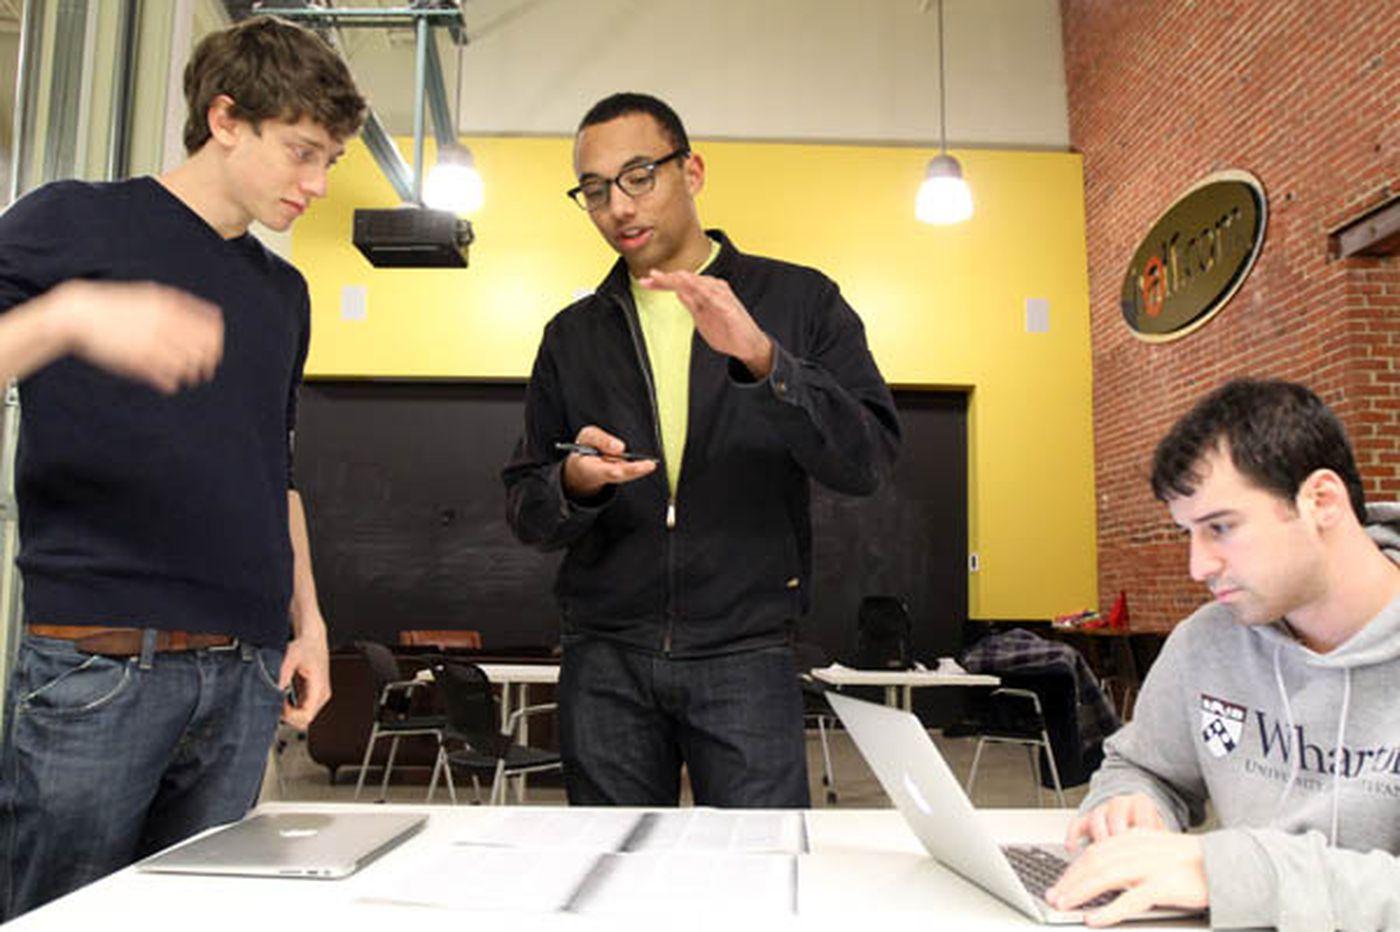 Fund lets students follow entrepreneurial dreams